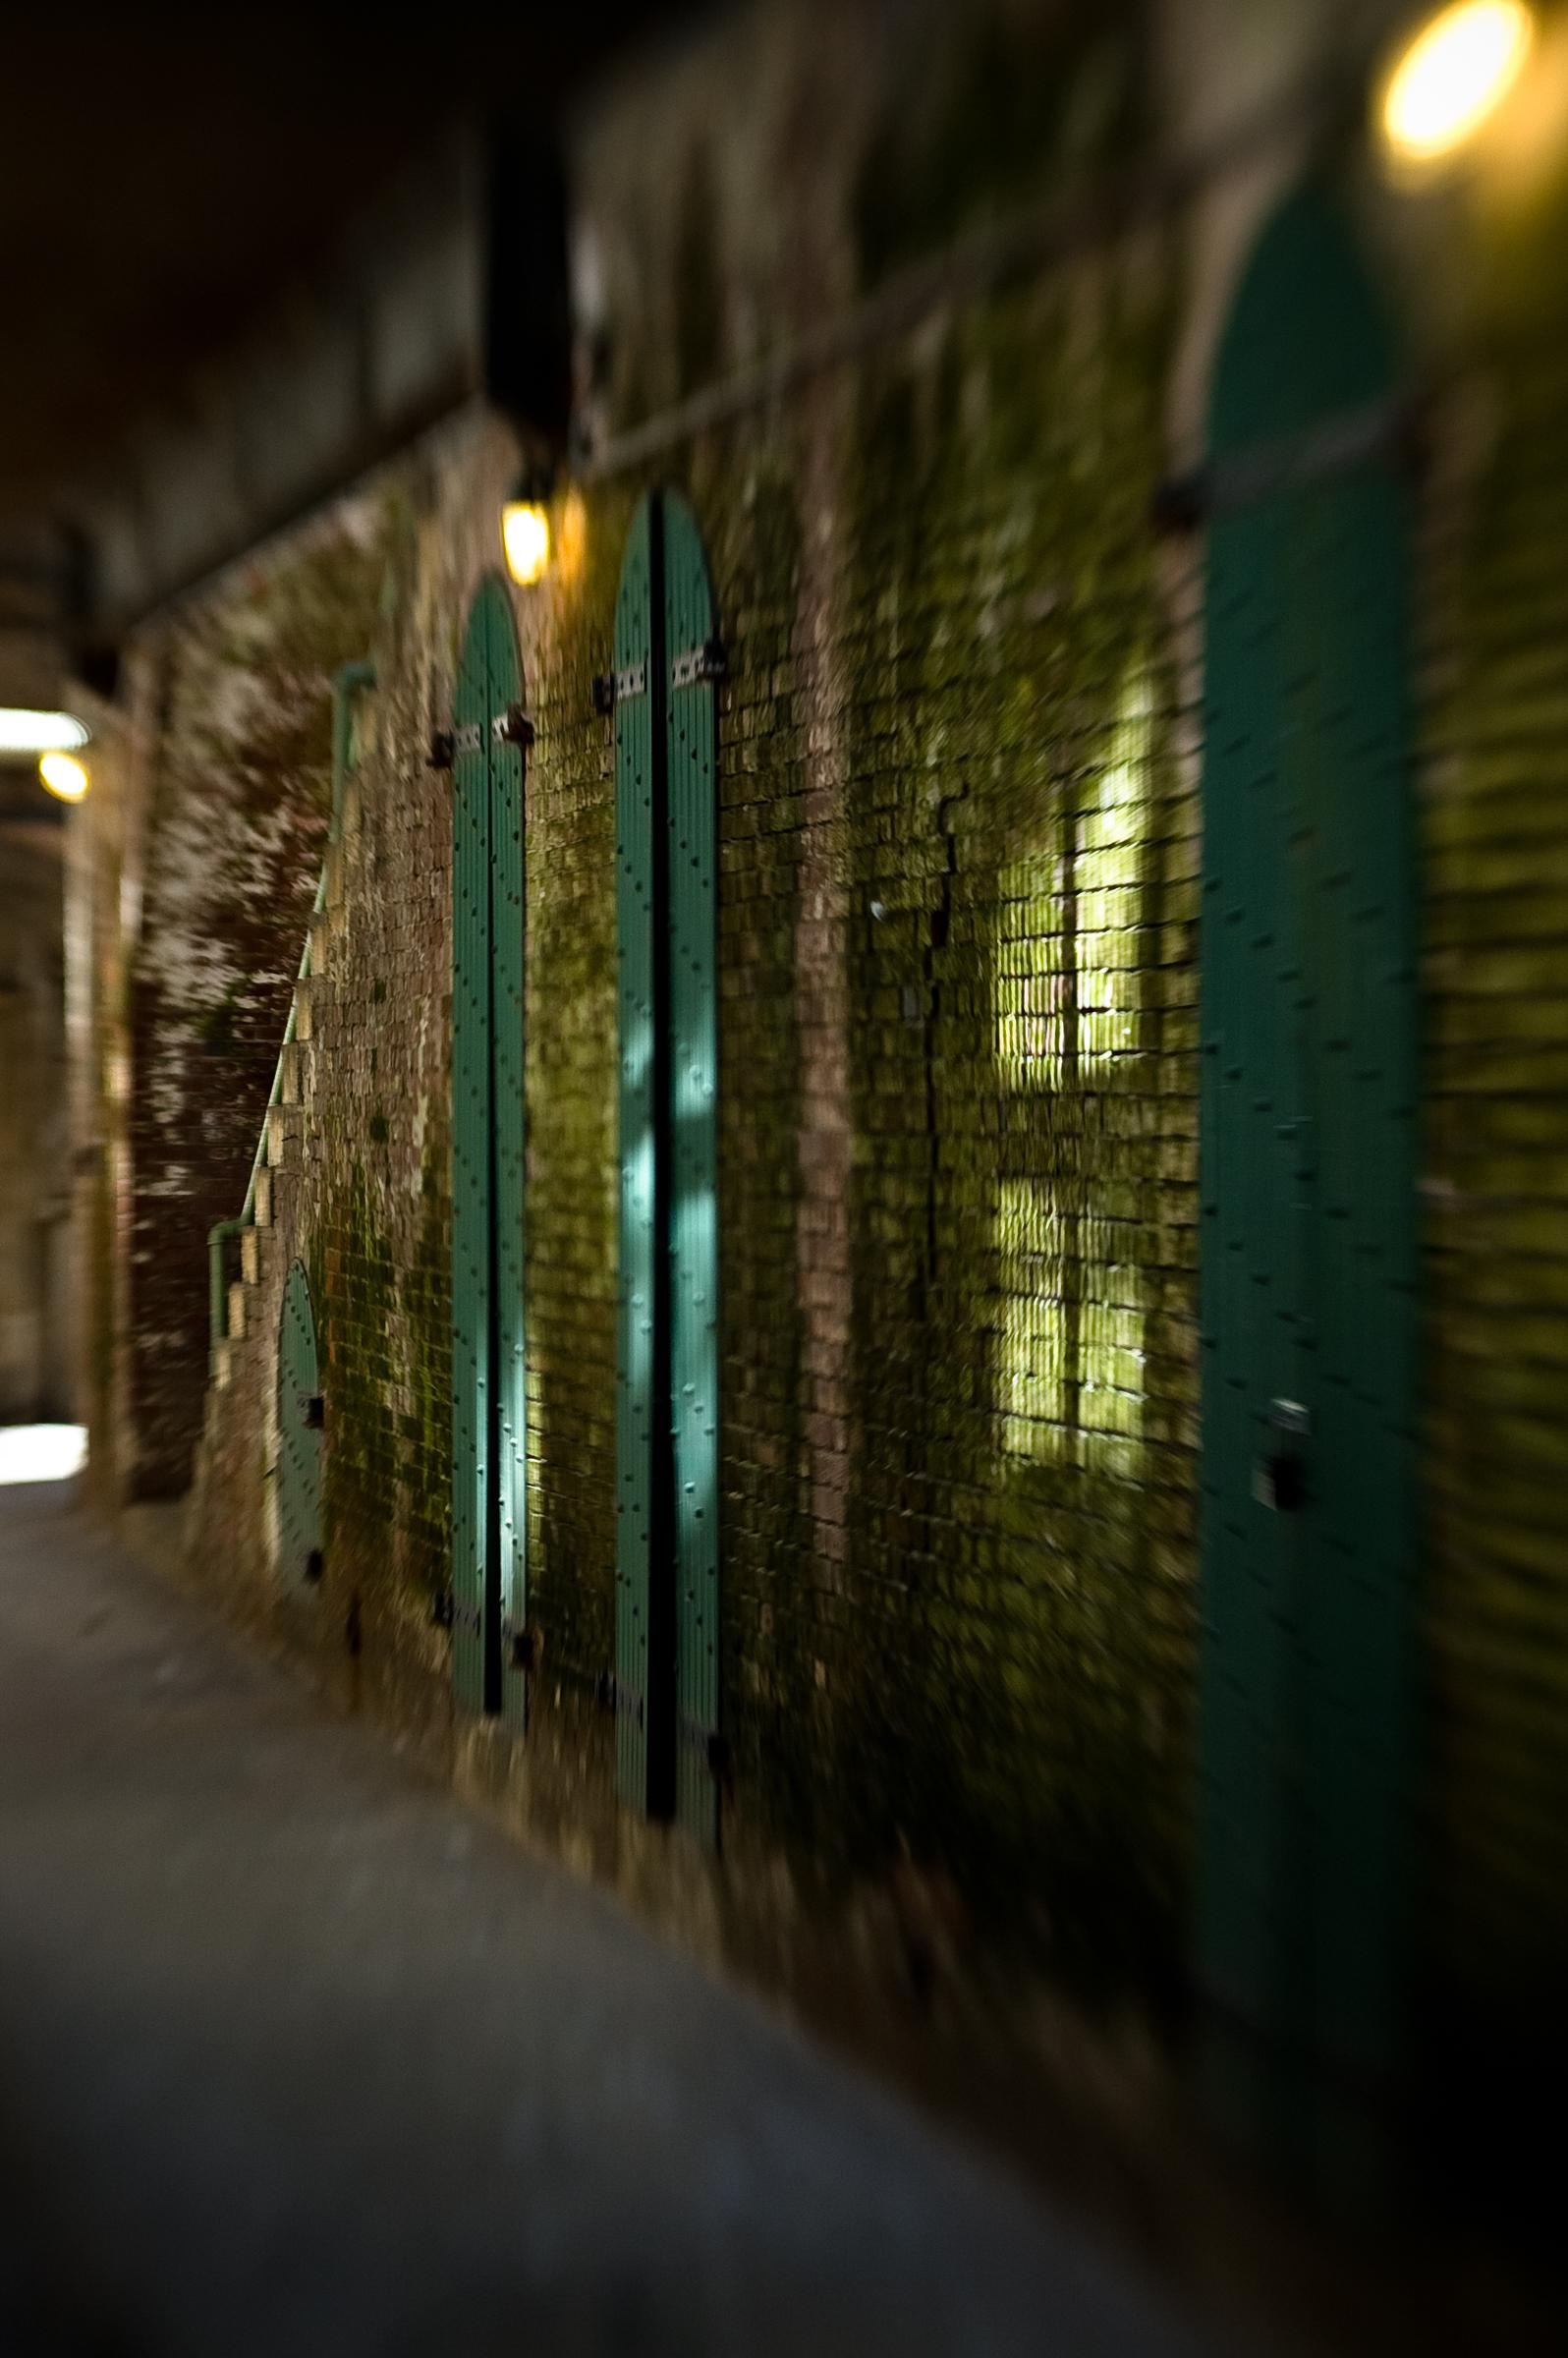 Street (Urban) Photography